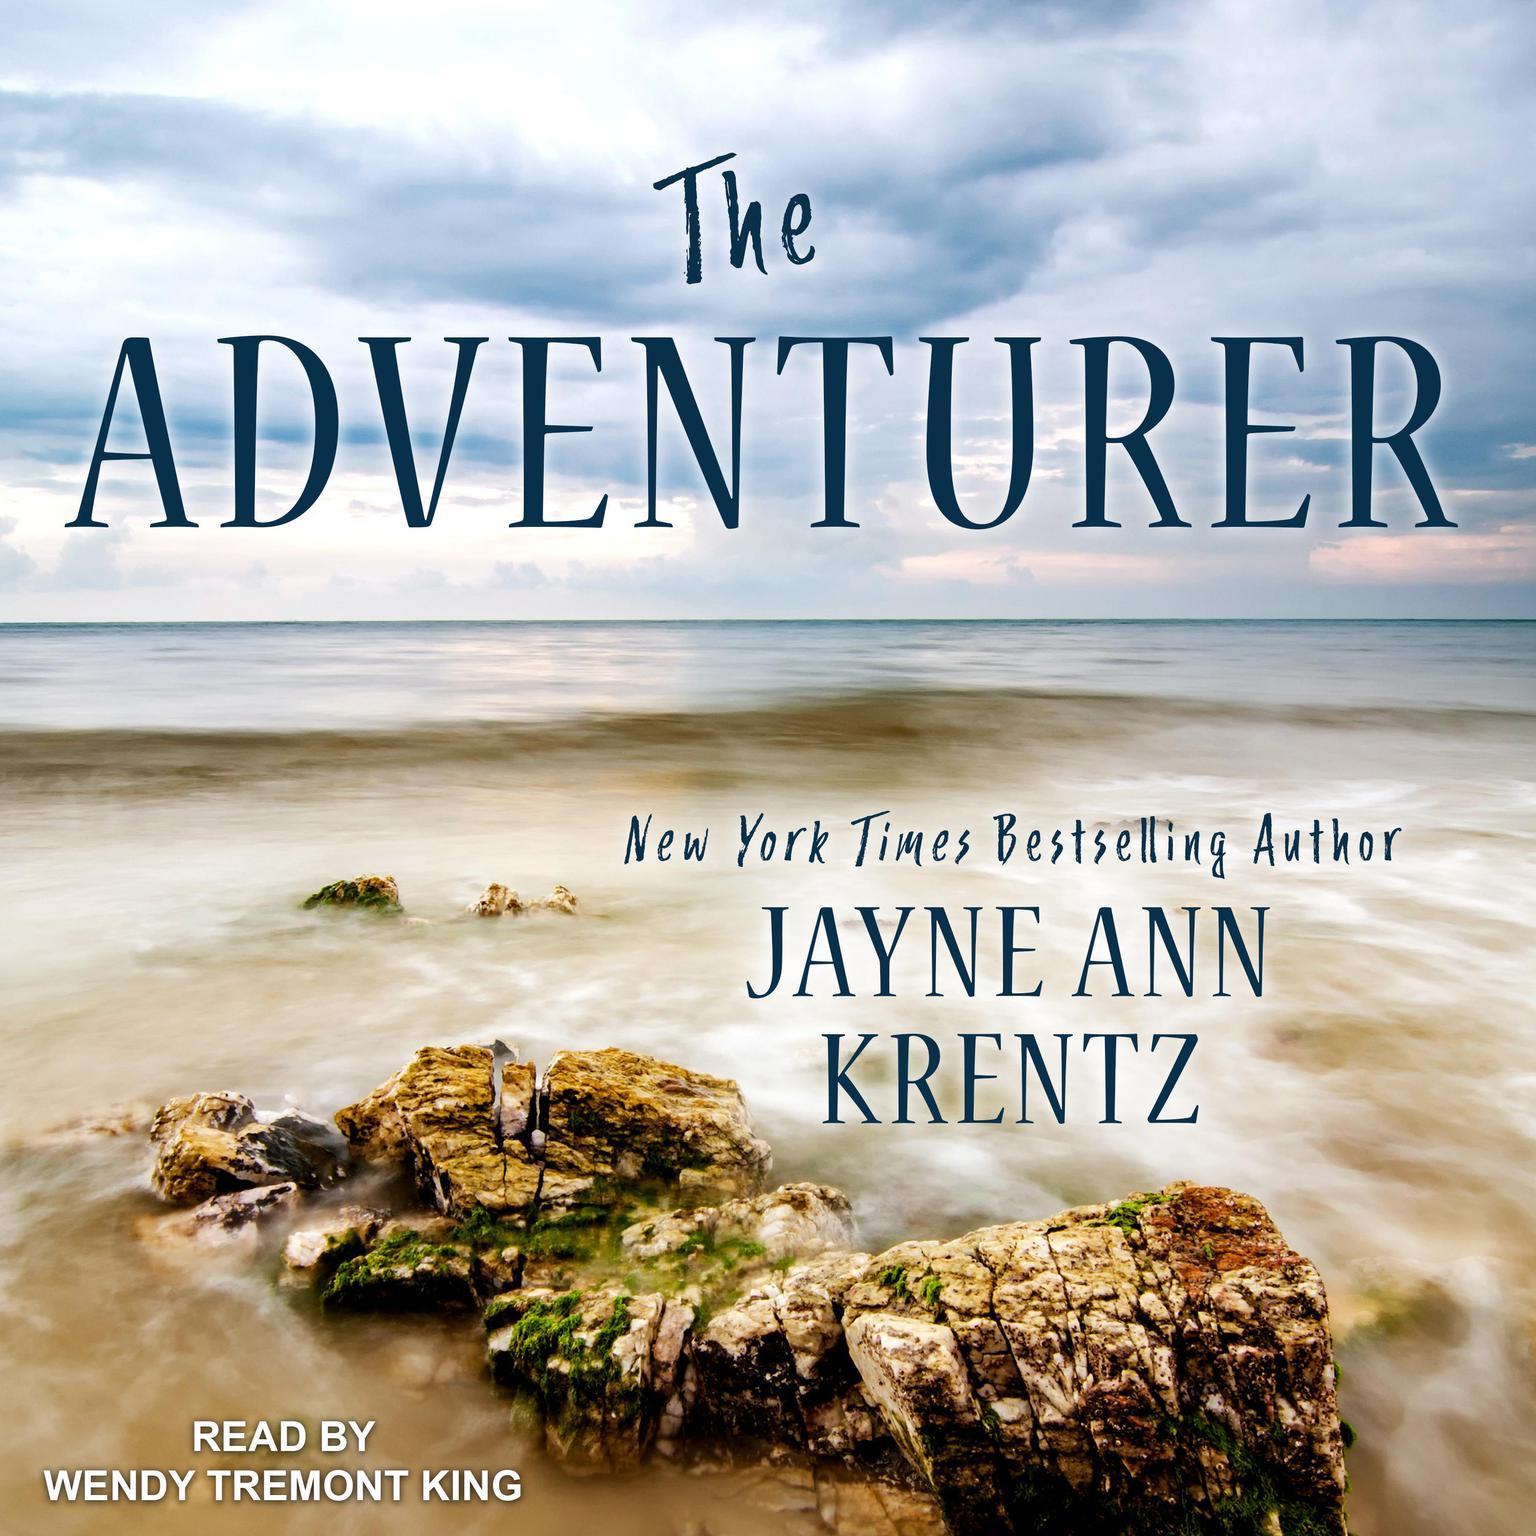 Printable The Adventurer Audiobook Cover Art